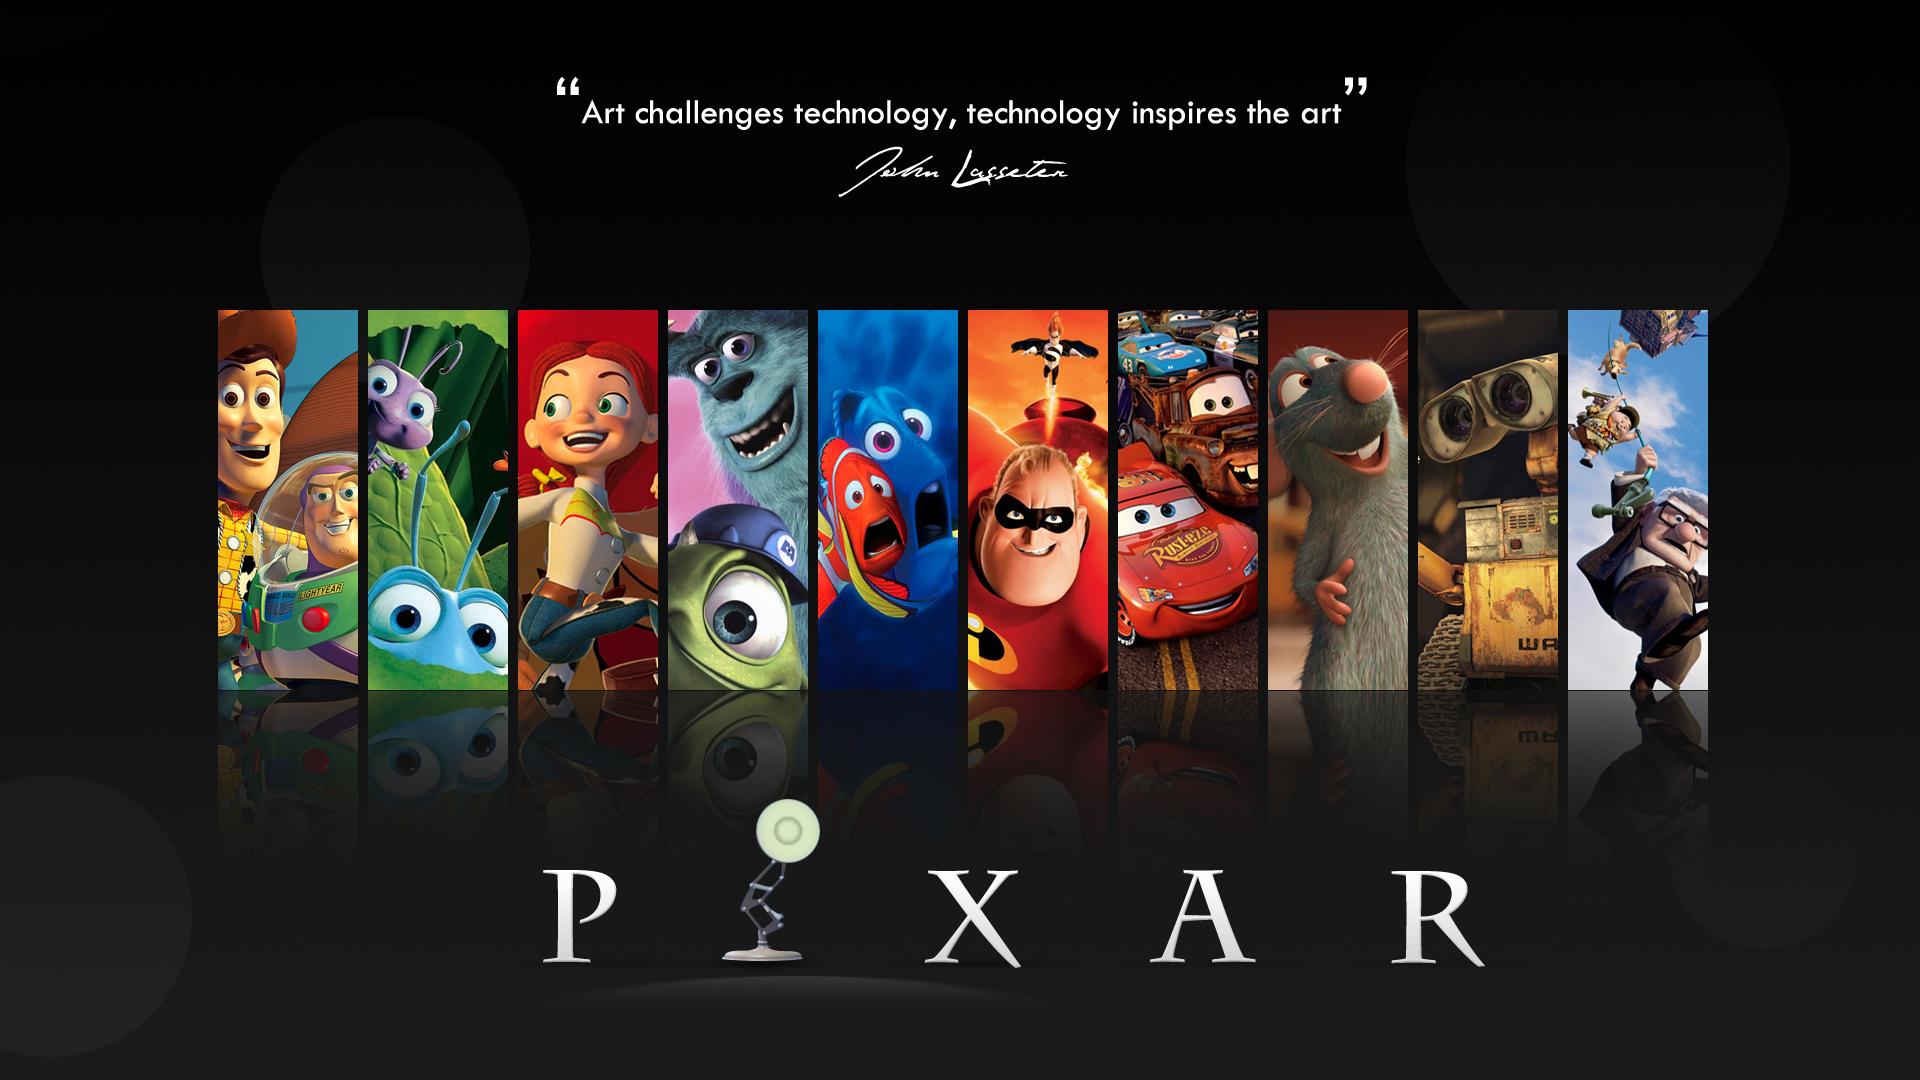 Wallpapers Pixar Movies Myspace Backgrounds Pixar Movies Backgrounds 1920x1080